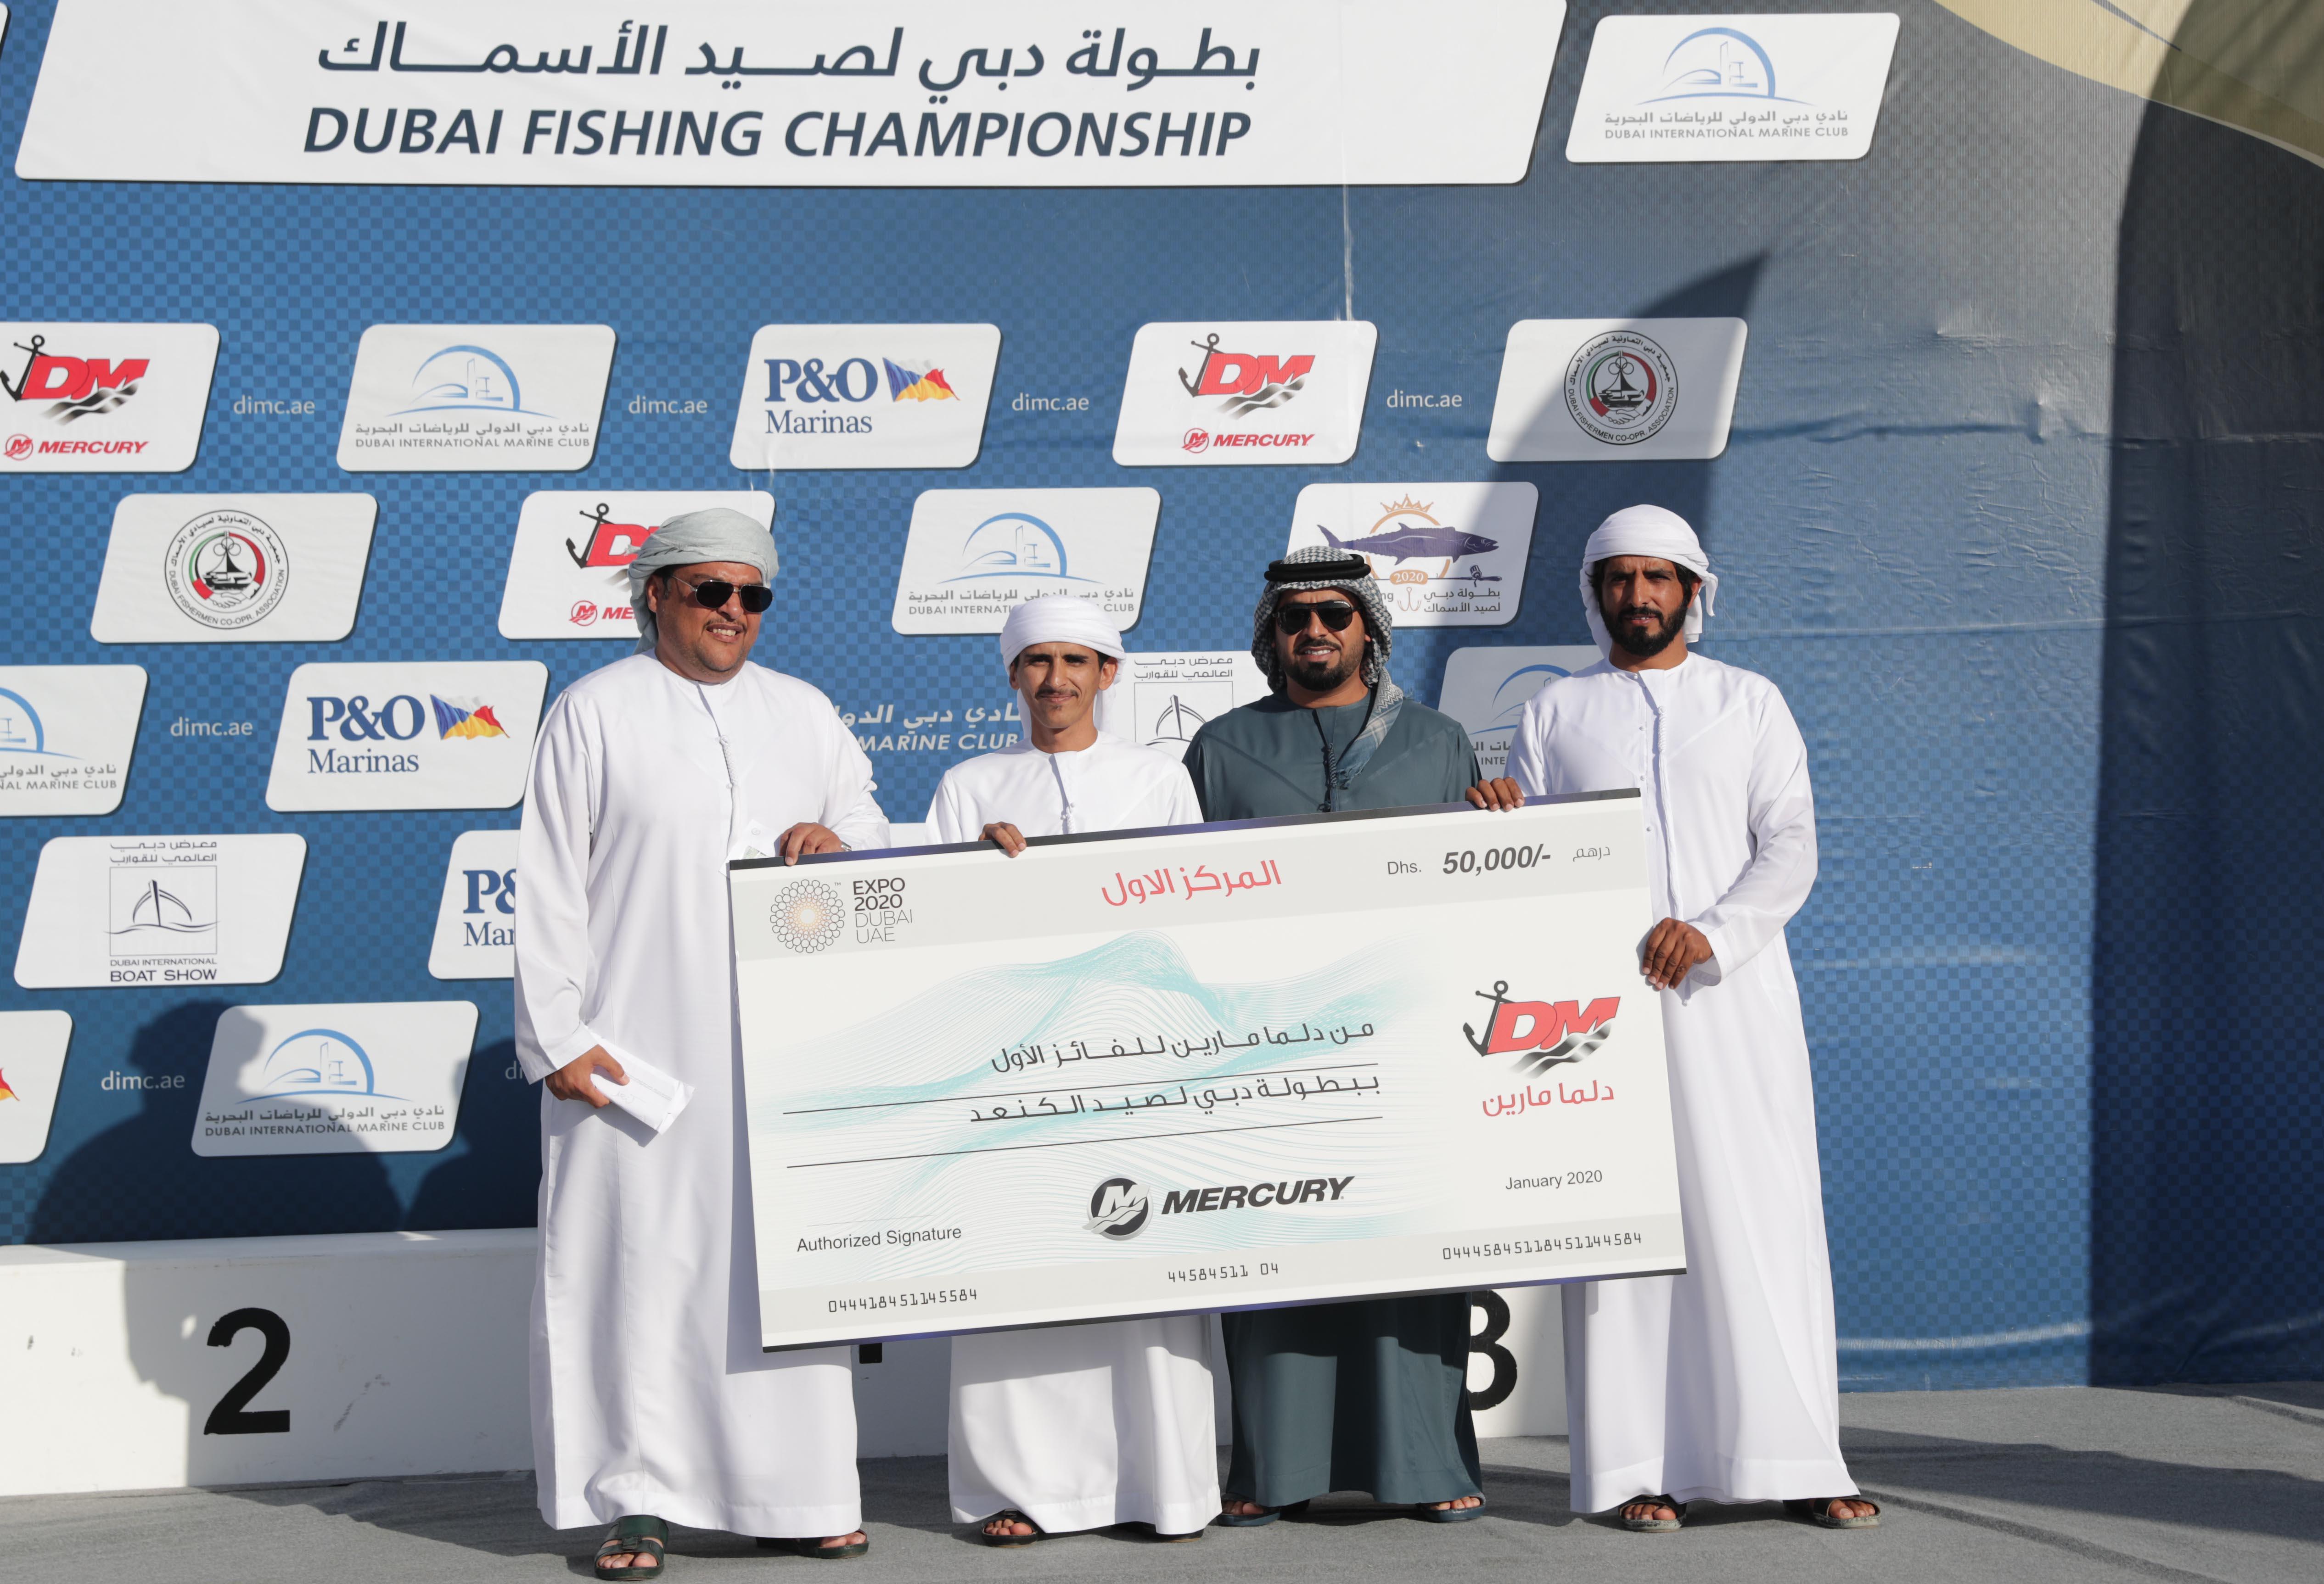 Dubai Fishing Championship kicks off today